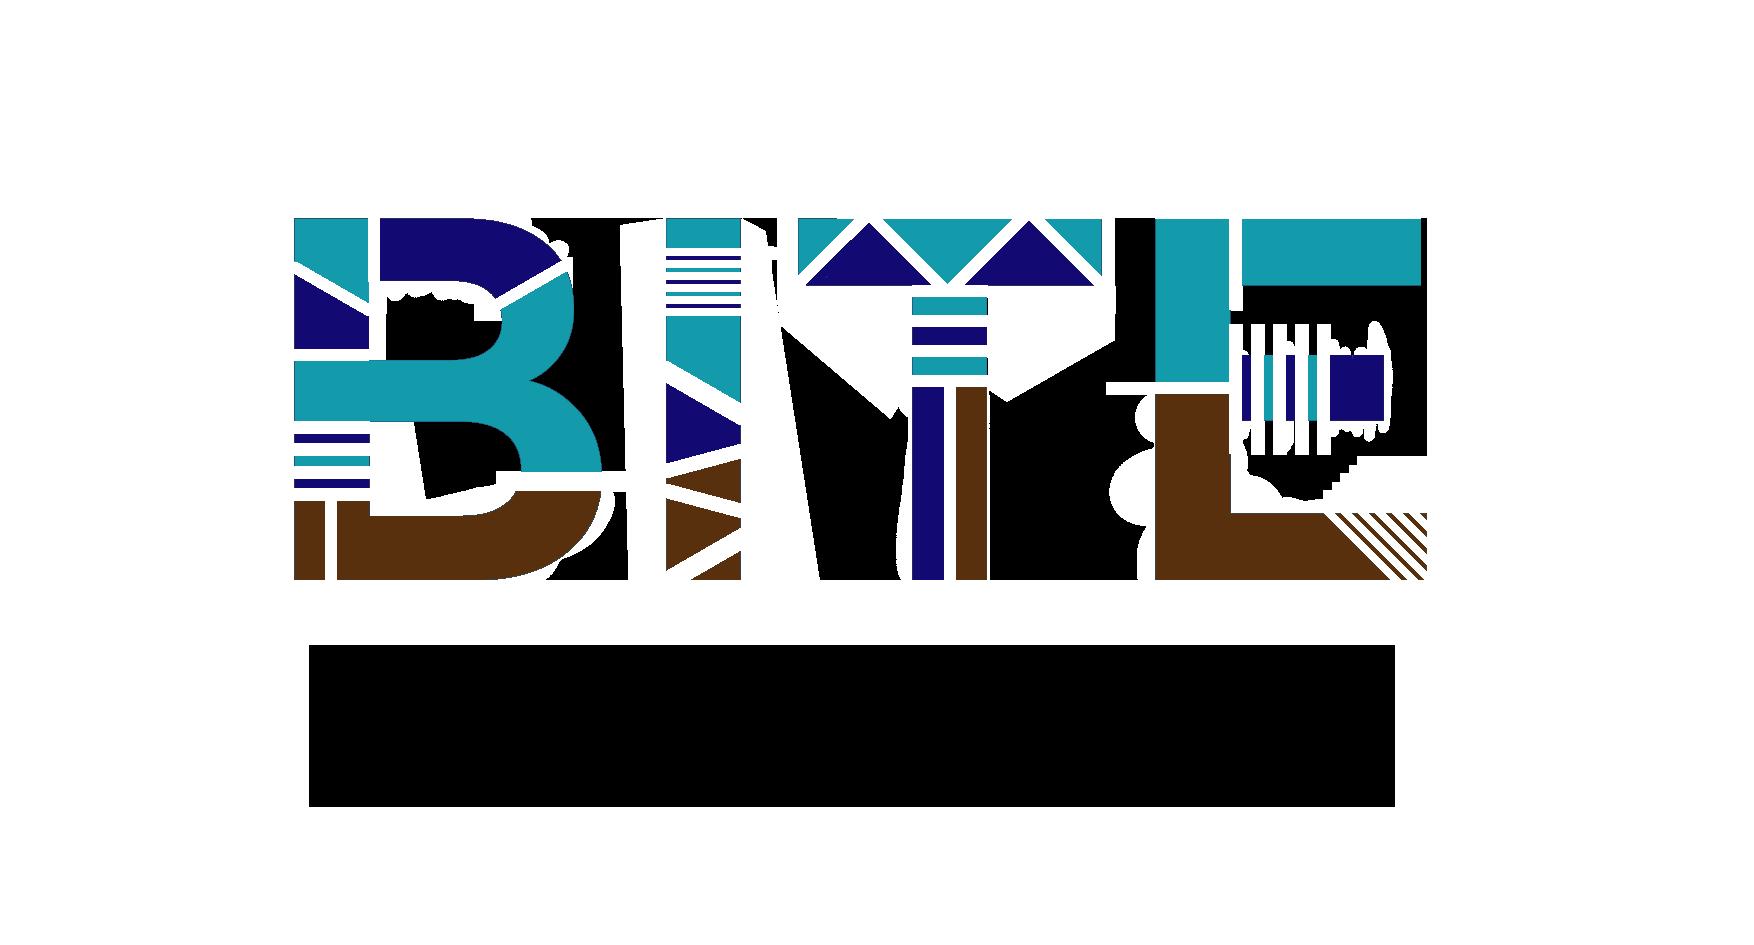 BITE - Building Integration Through Entrepreneurship